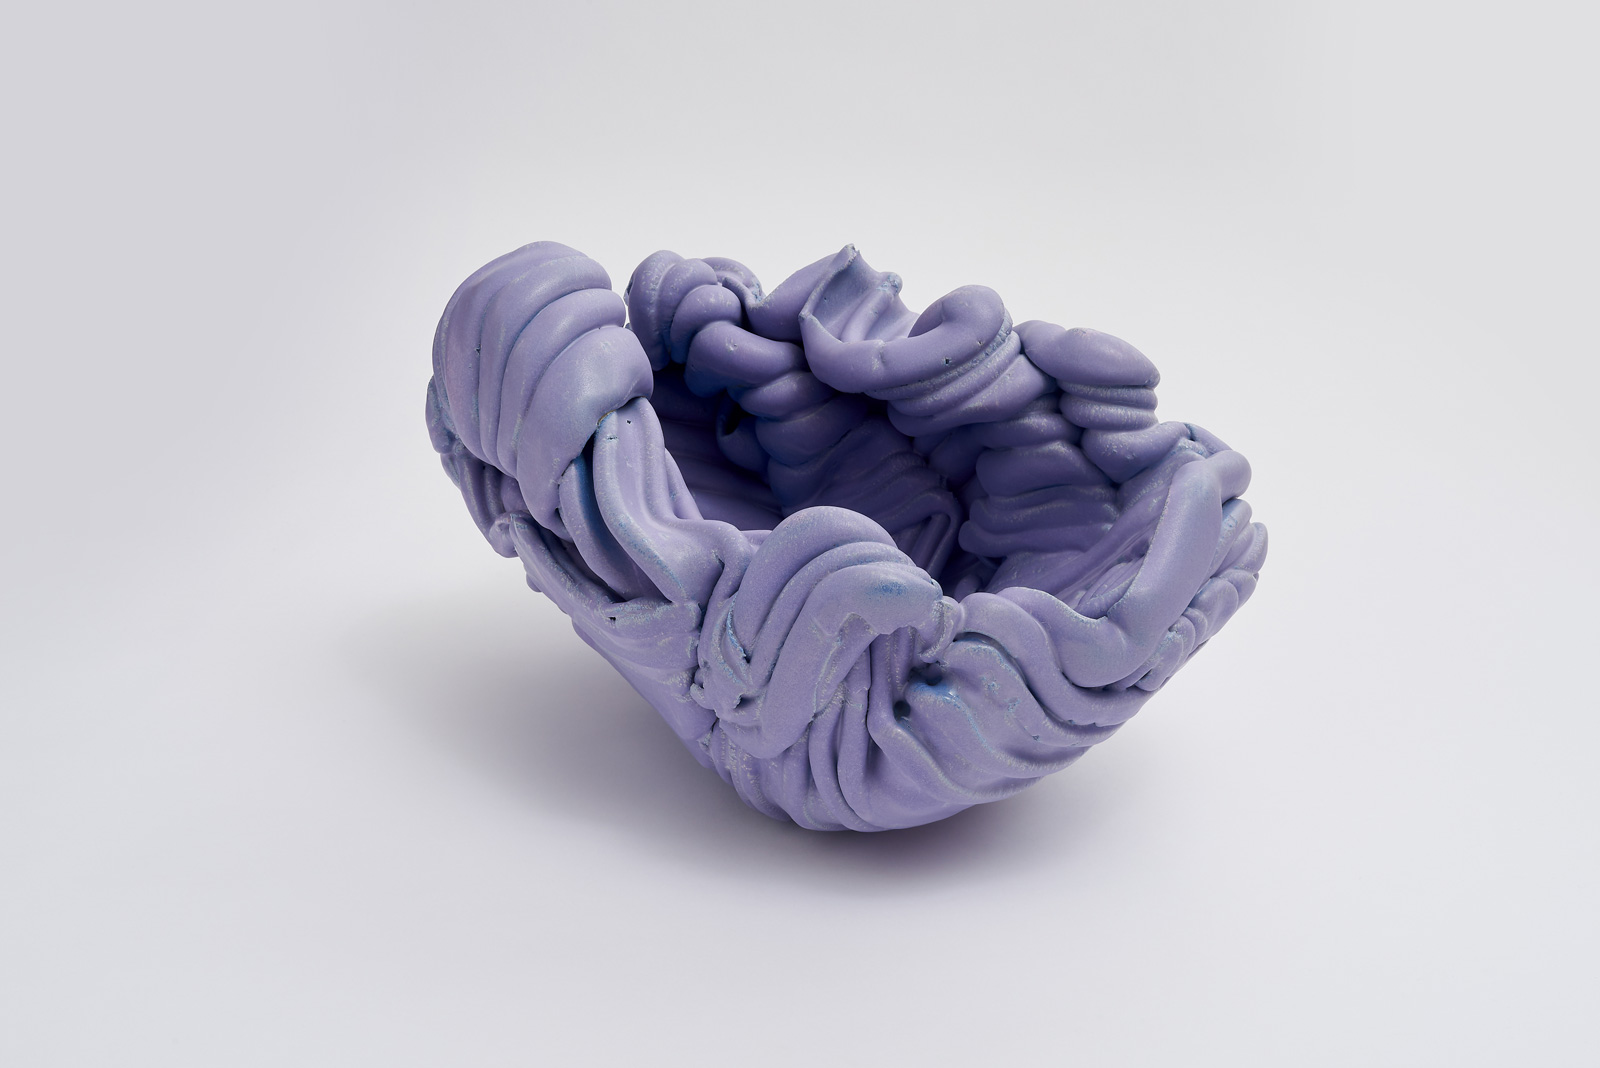 SetarehGalerie_Skulpturen-04a